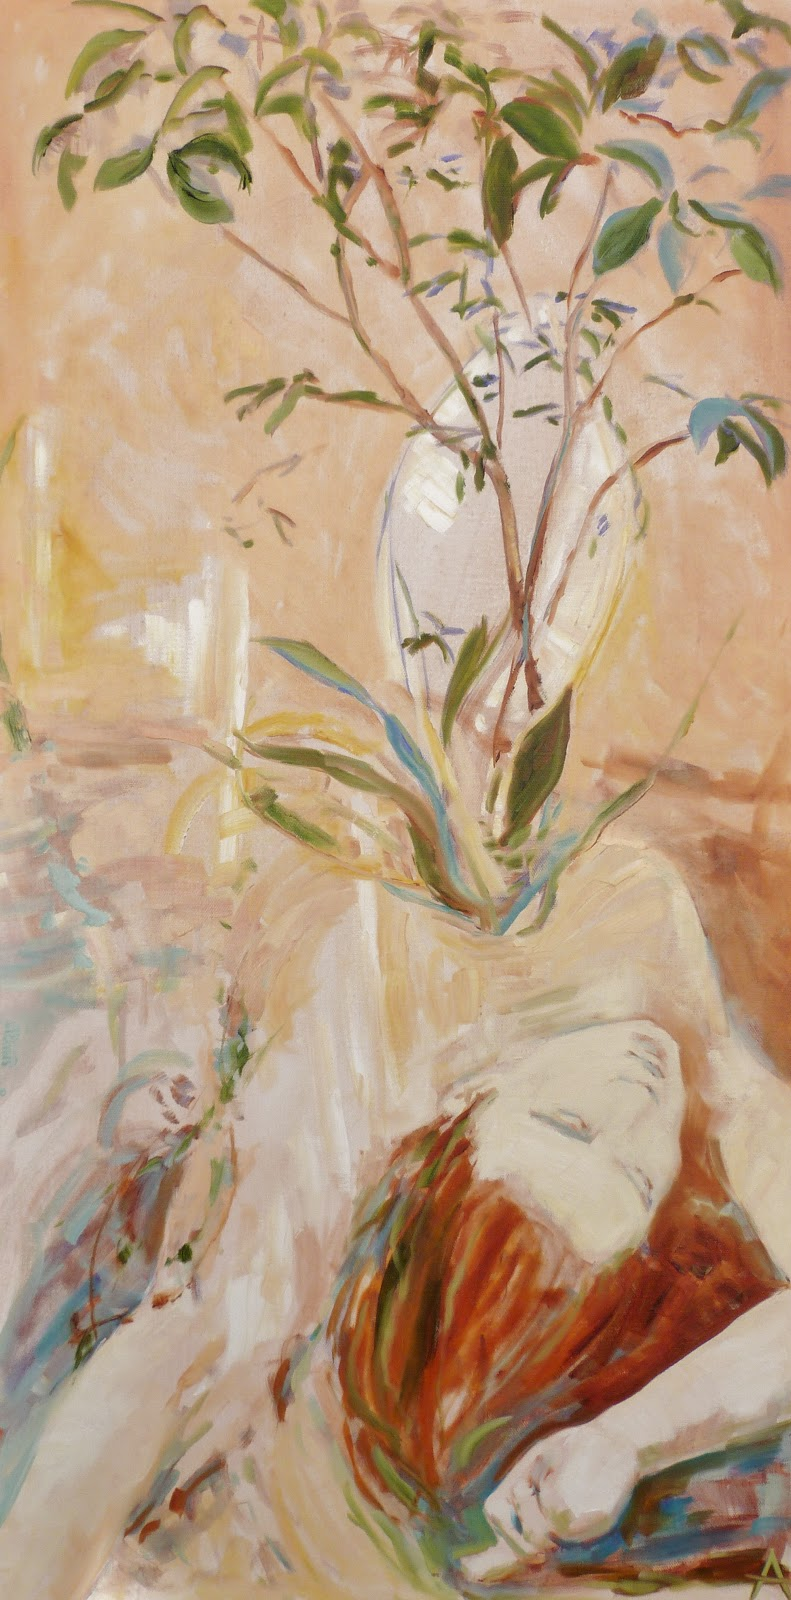 SOLD, Reincarnation, Oil on Canvas, Copyright 2012 Hirschten